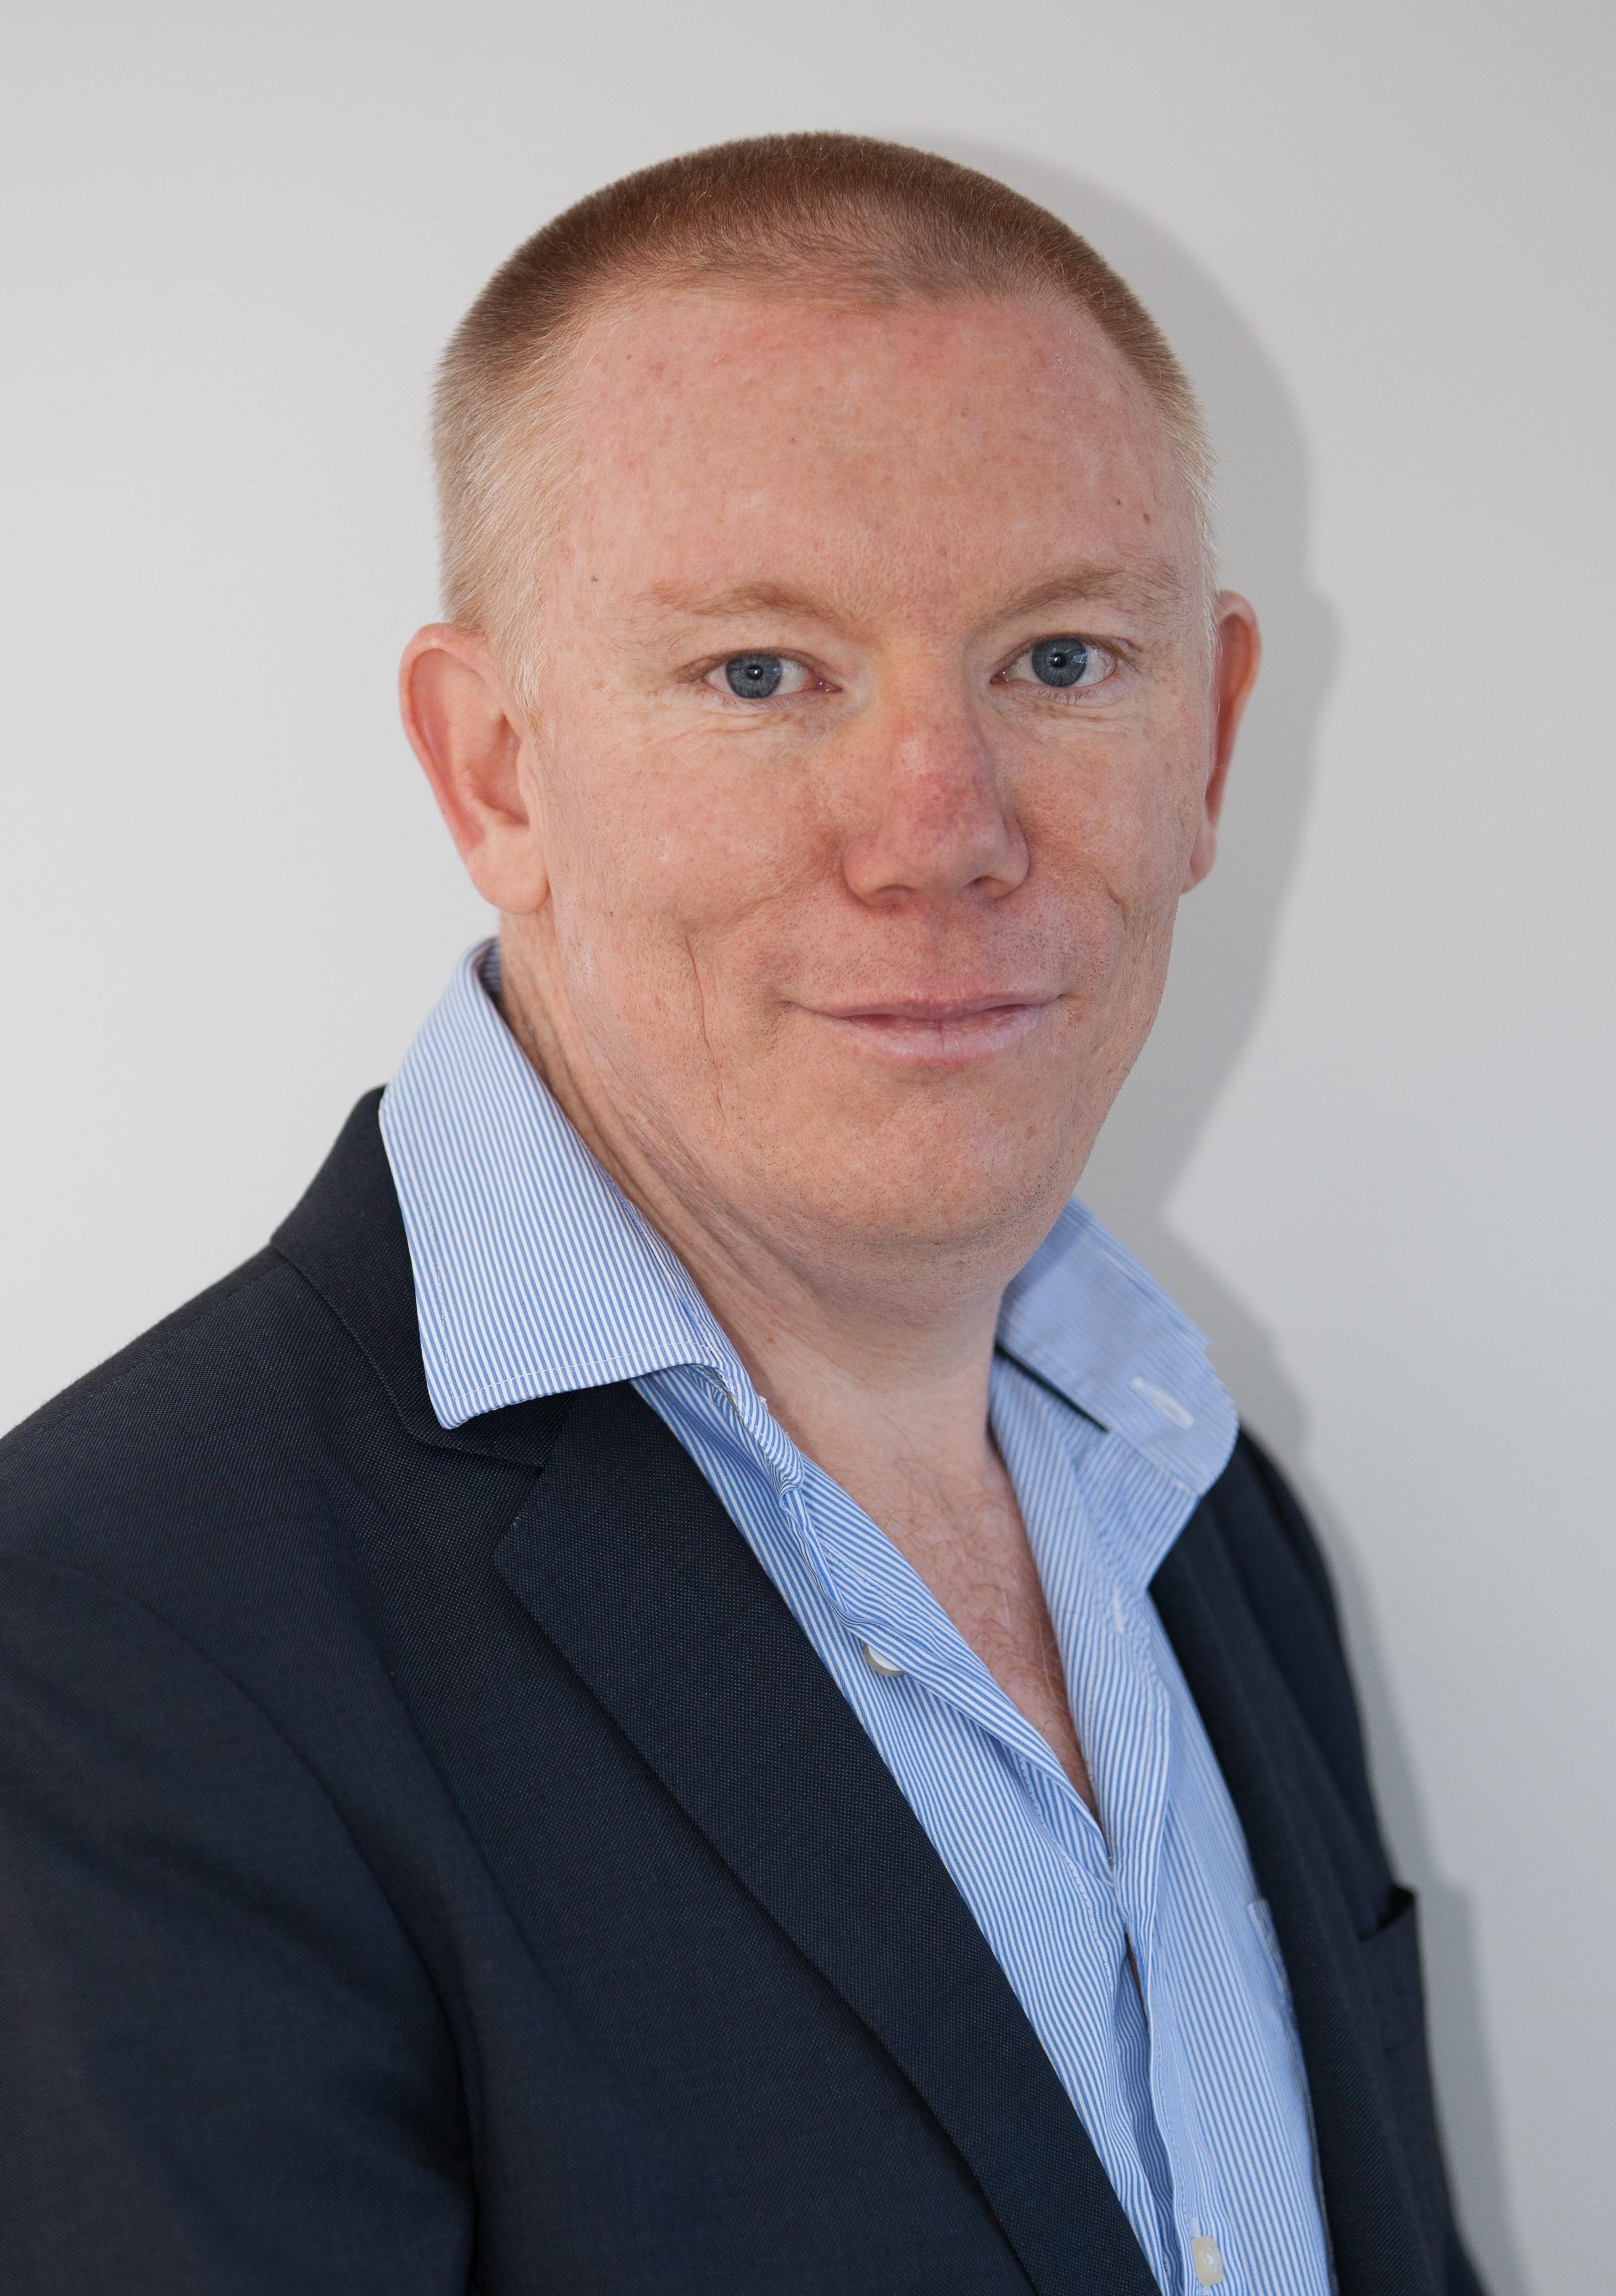 Tim Neale